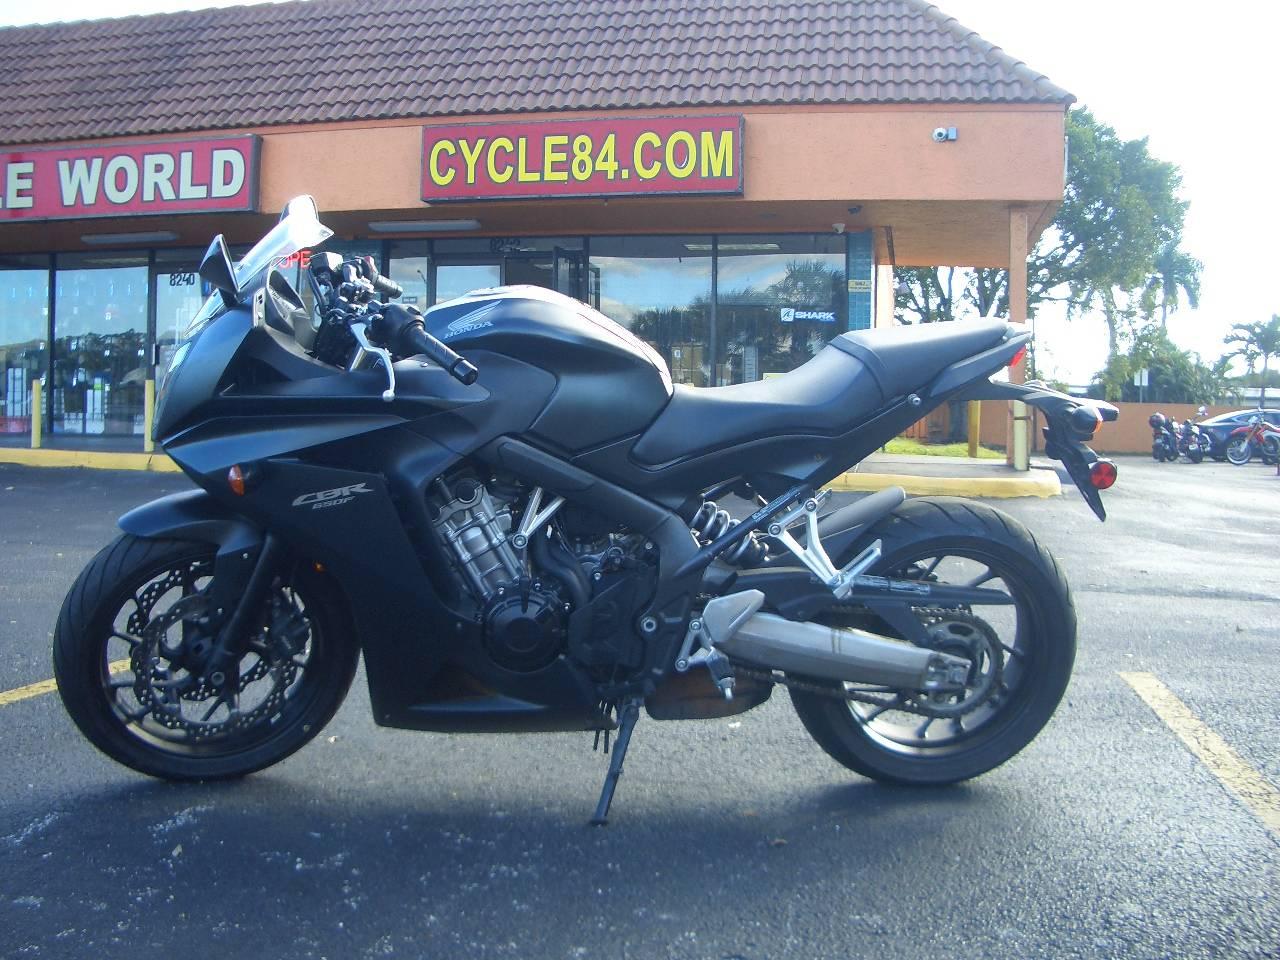 2014 Honda Cbr 650f Abs Matte Black Metallic Motorcycles Fort Lauderdale Florida 28tks